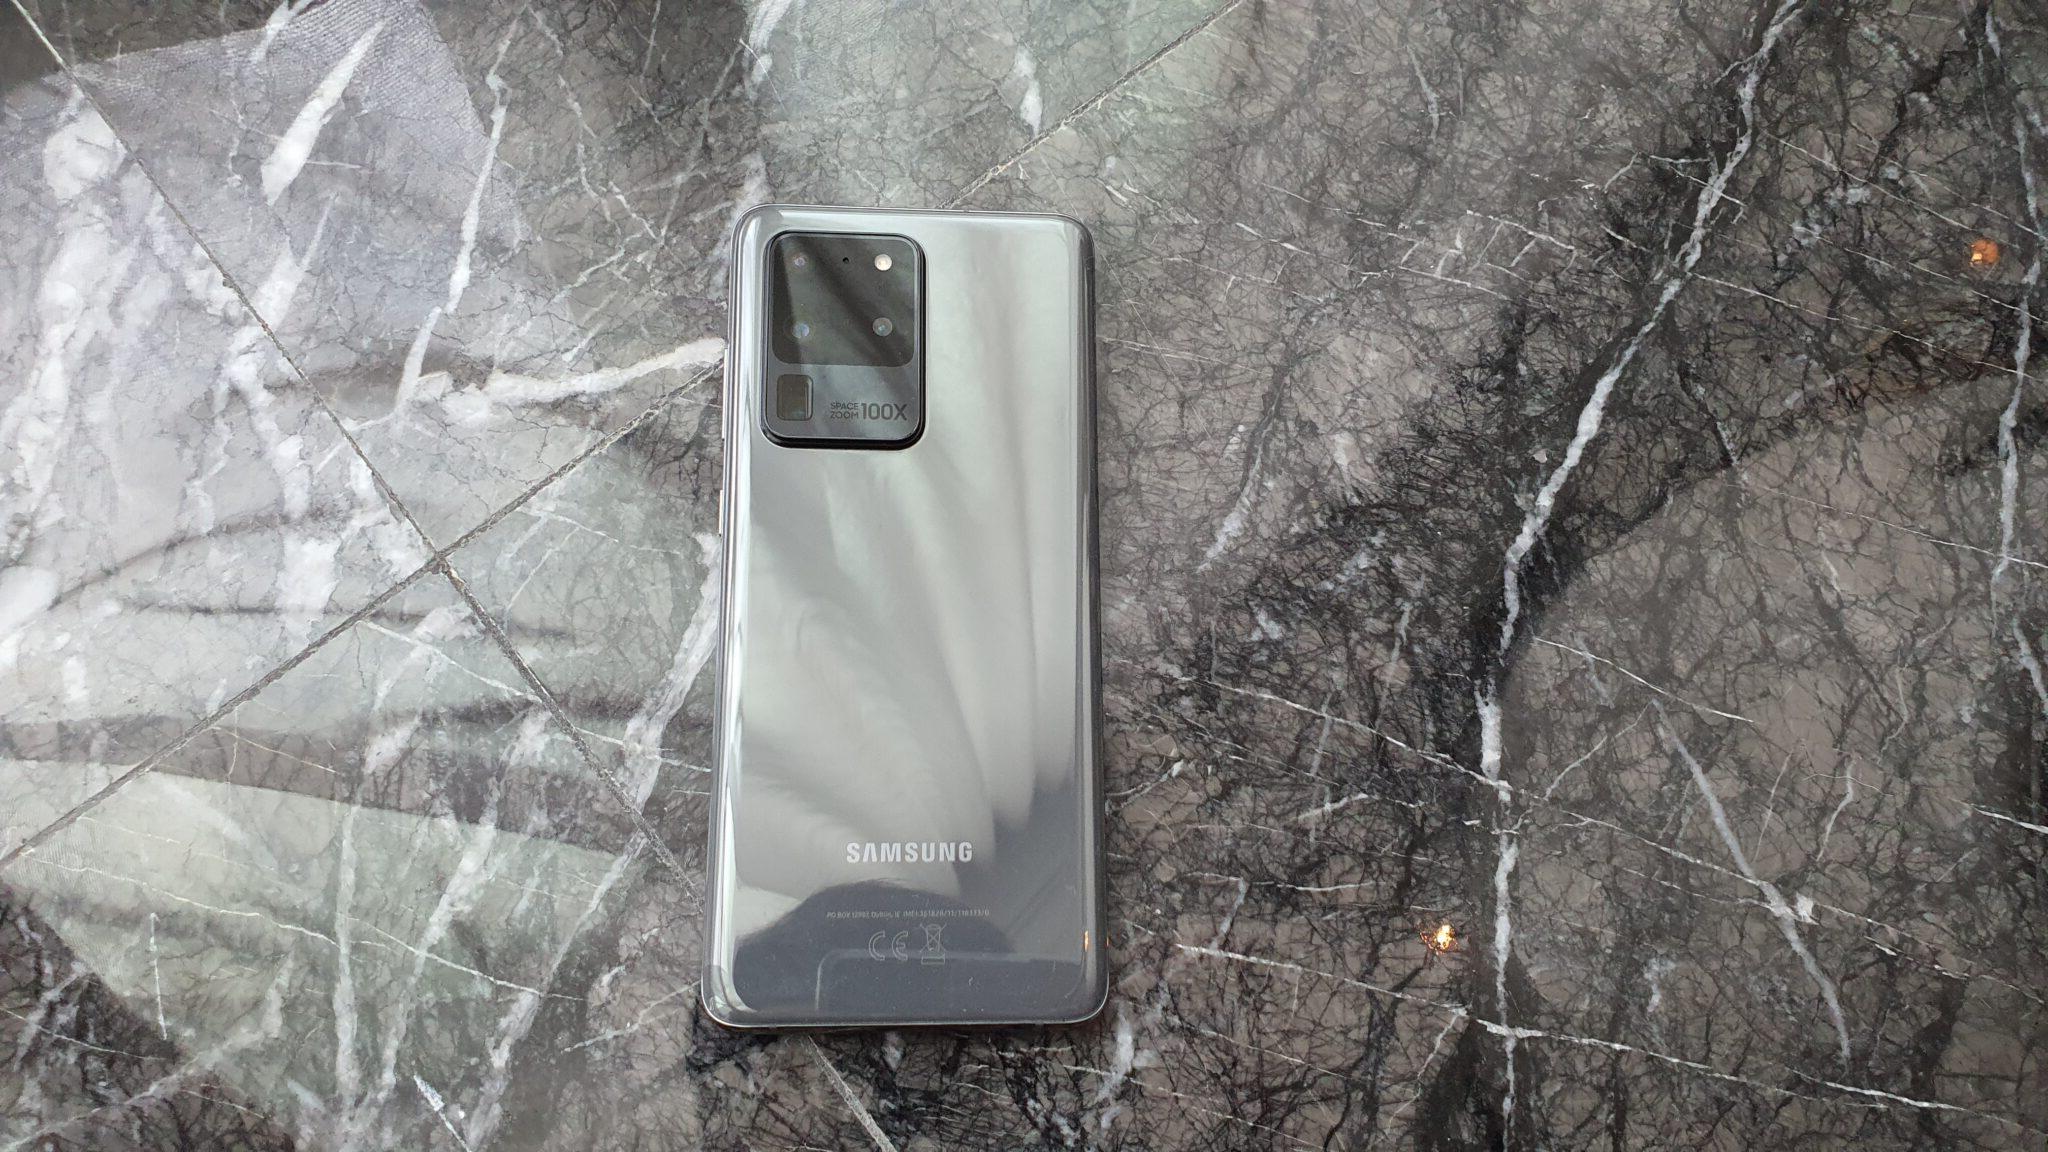 Galaxy S20 Ultra rear